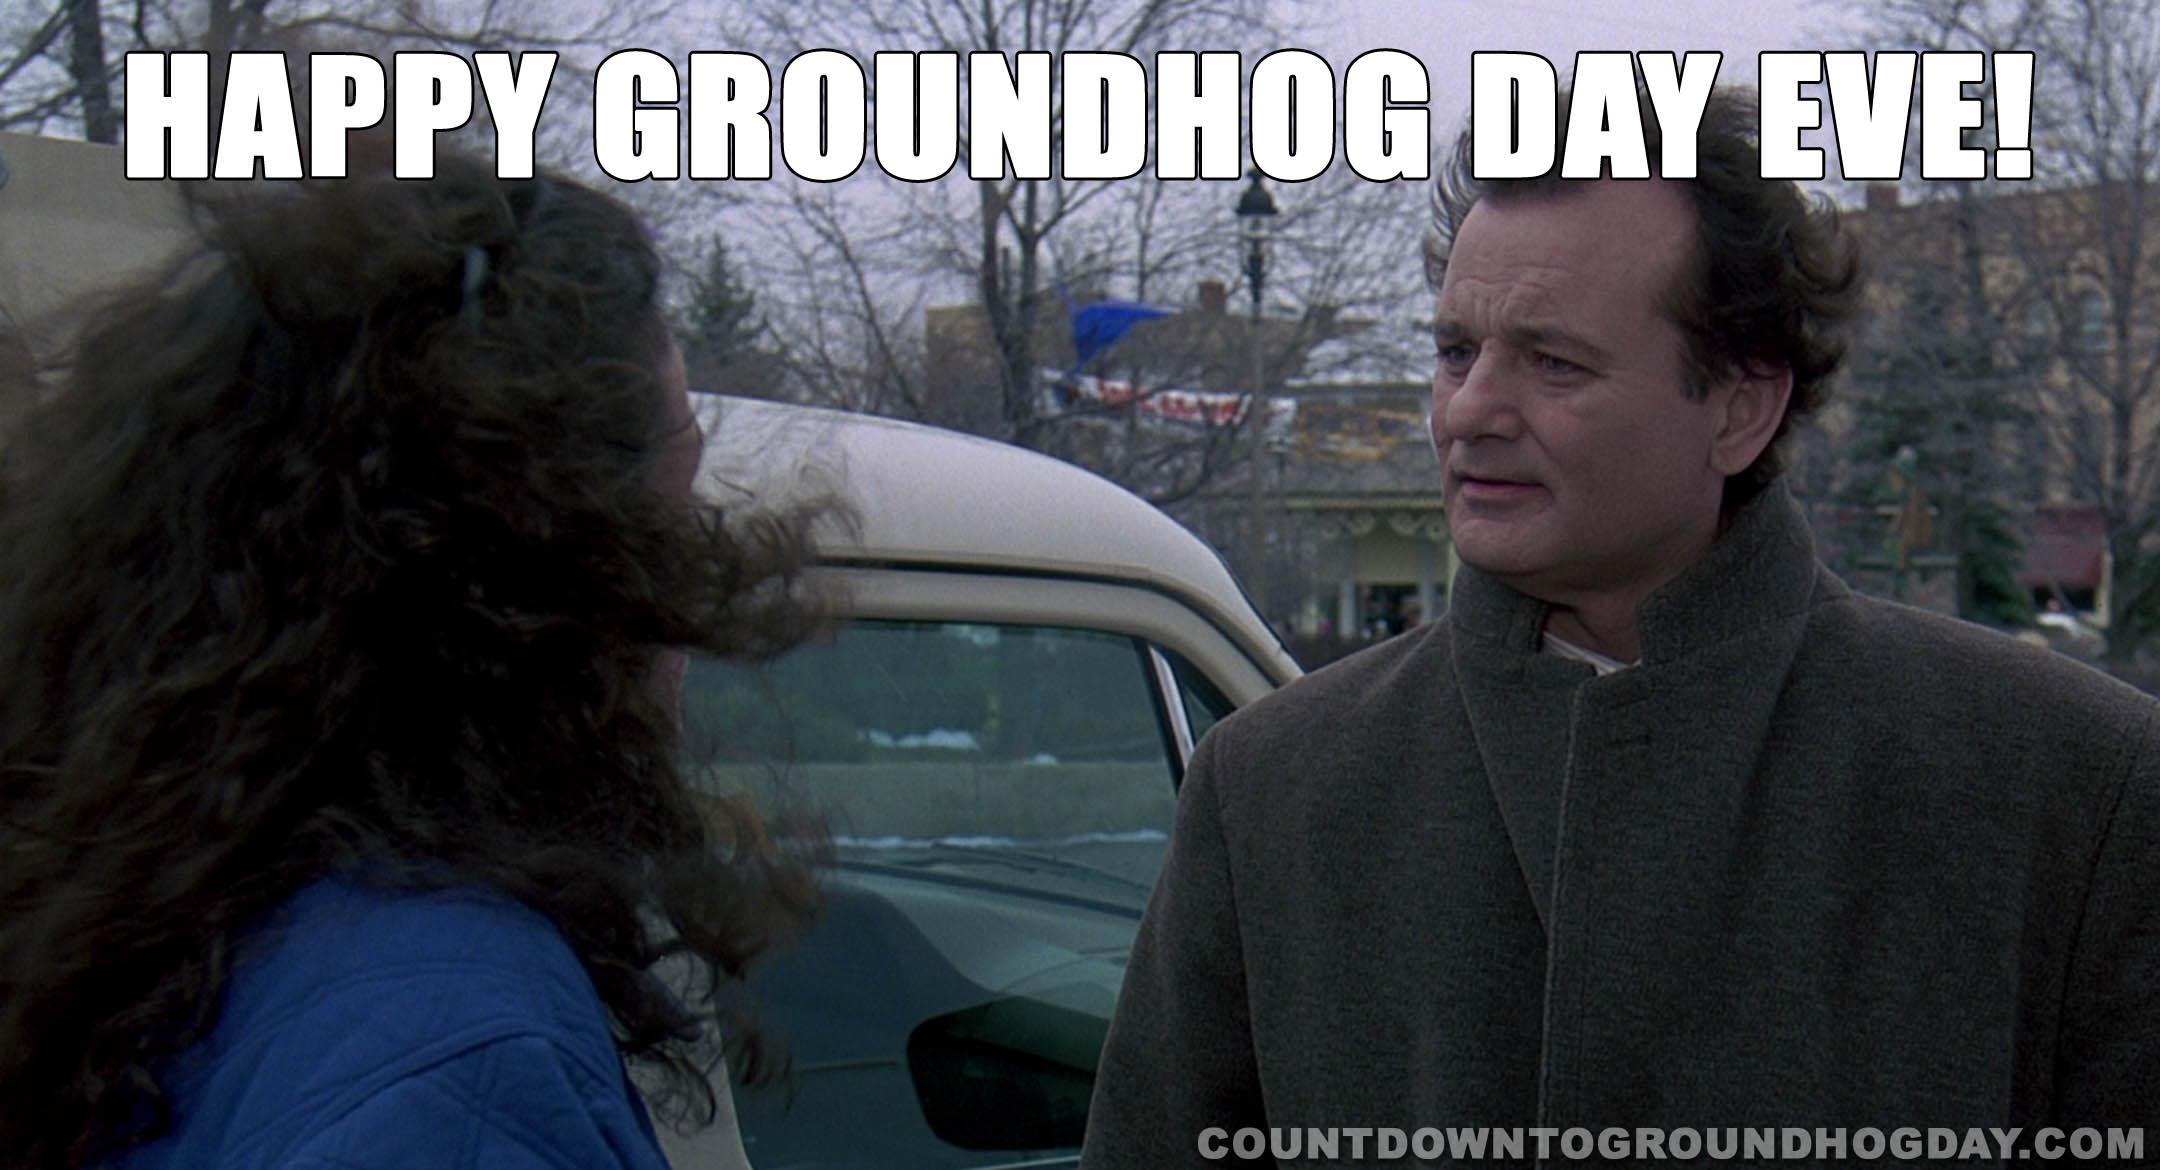 Happy Groundhog Day Eve